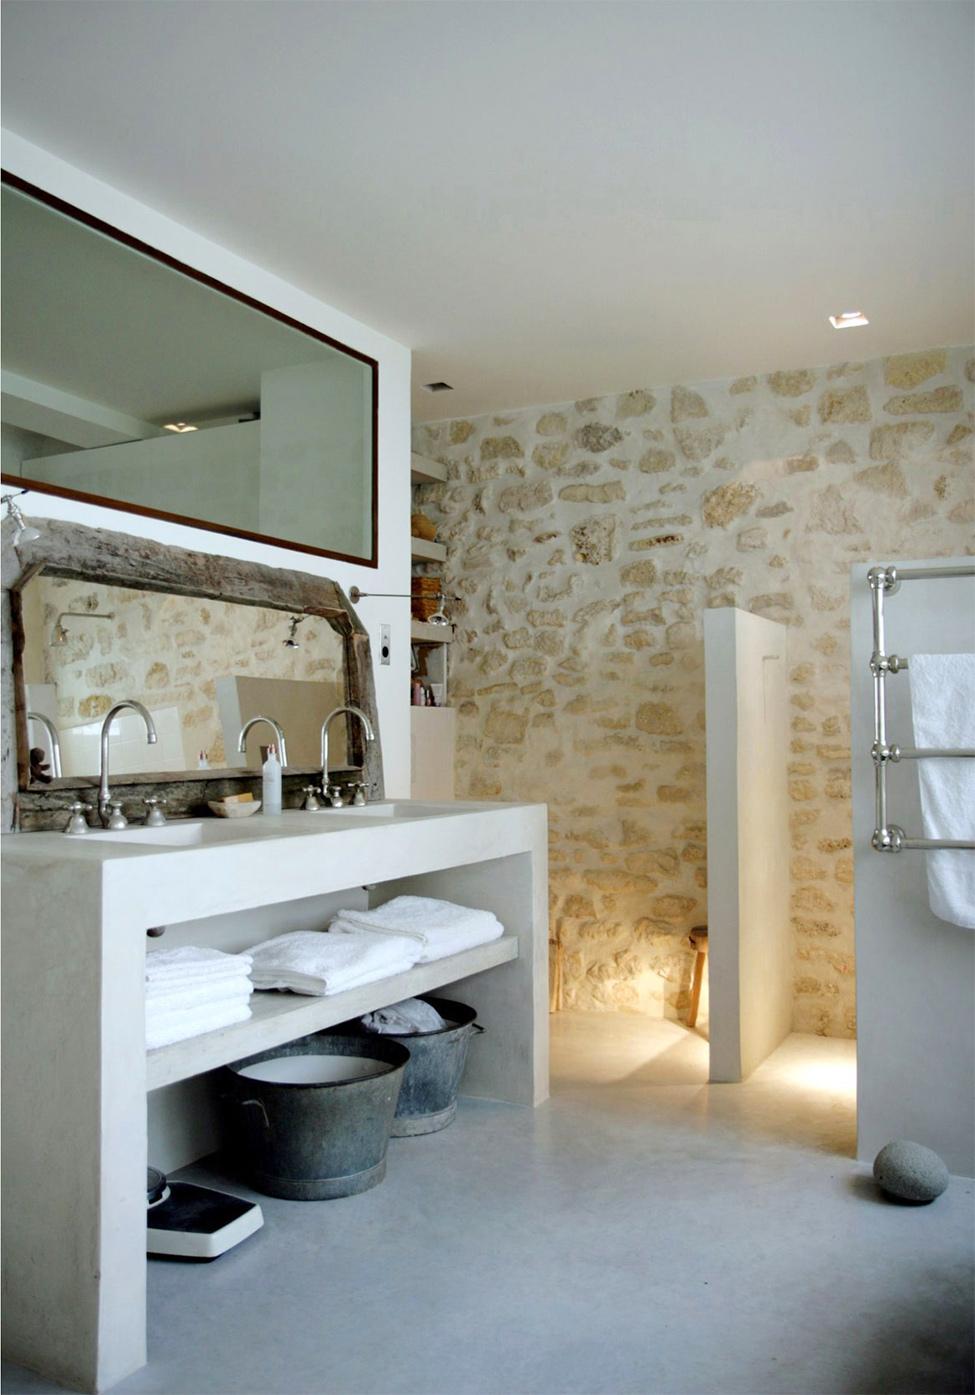 Platos de ducha de obra de microcemento